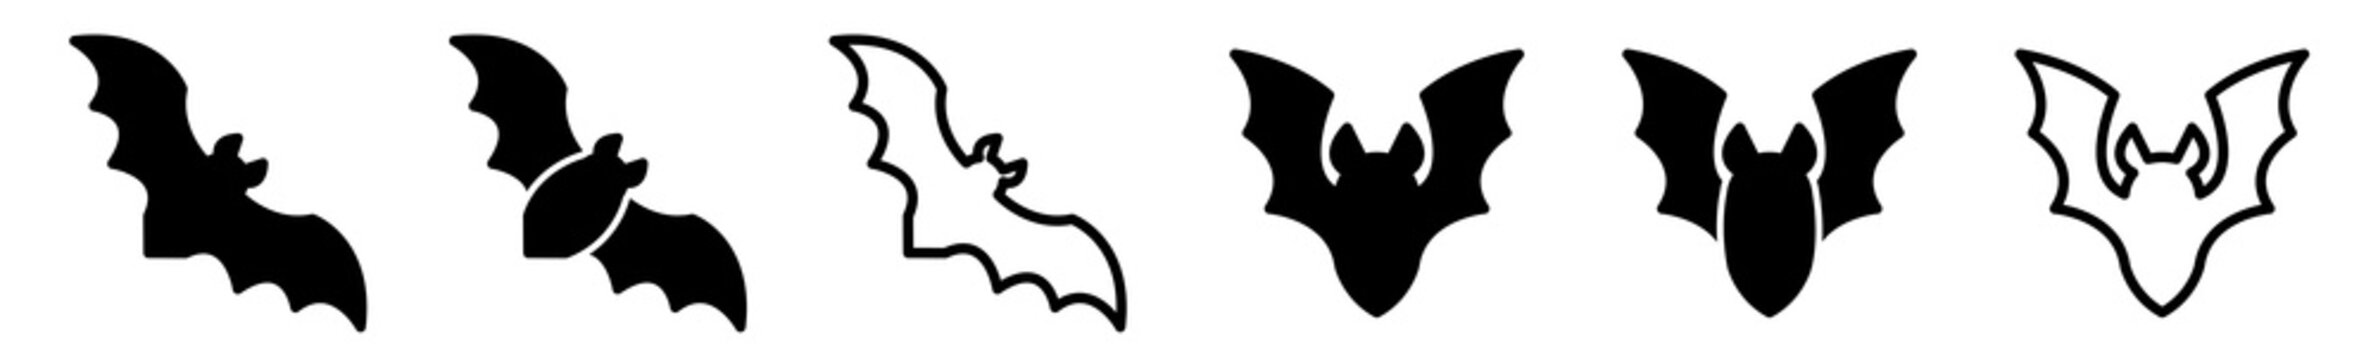 Bat Icon Black | Flying Bats Illustration | Halloween Symbol | Vampire Logo | Scary Sign | Isolated | Variations